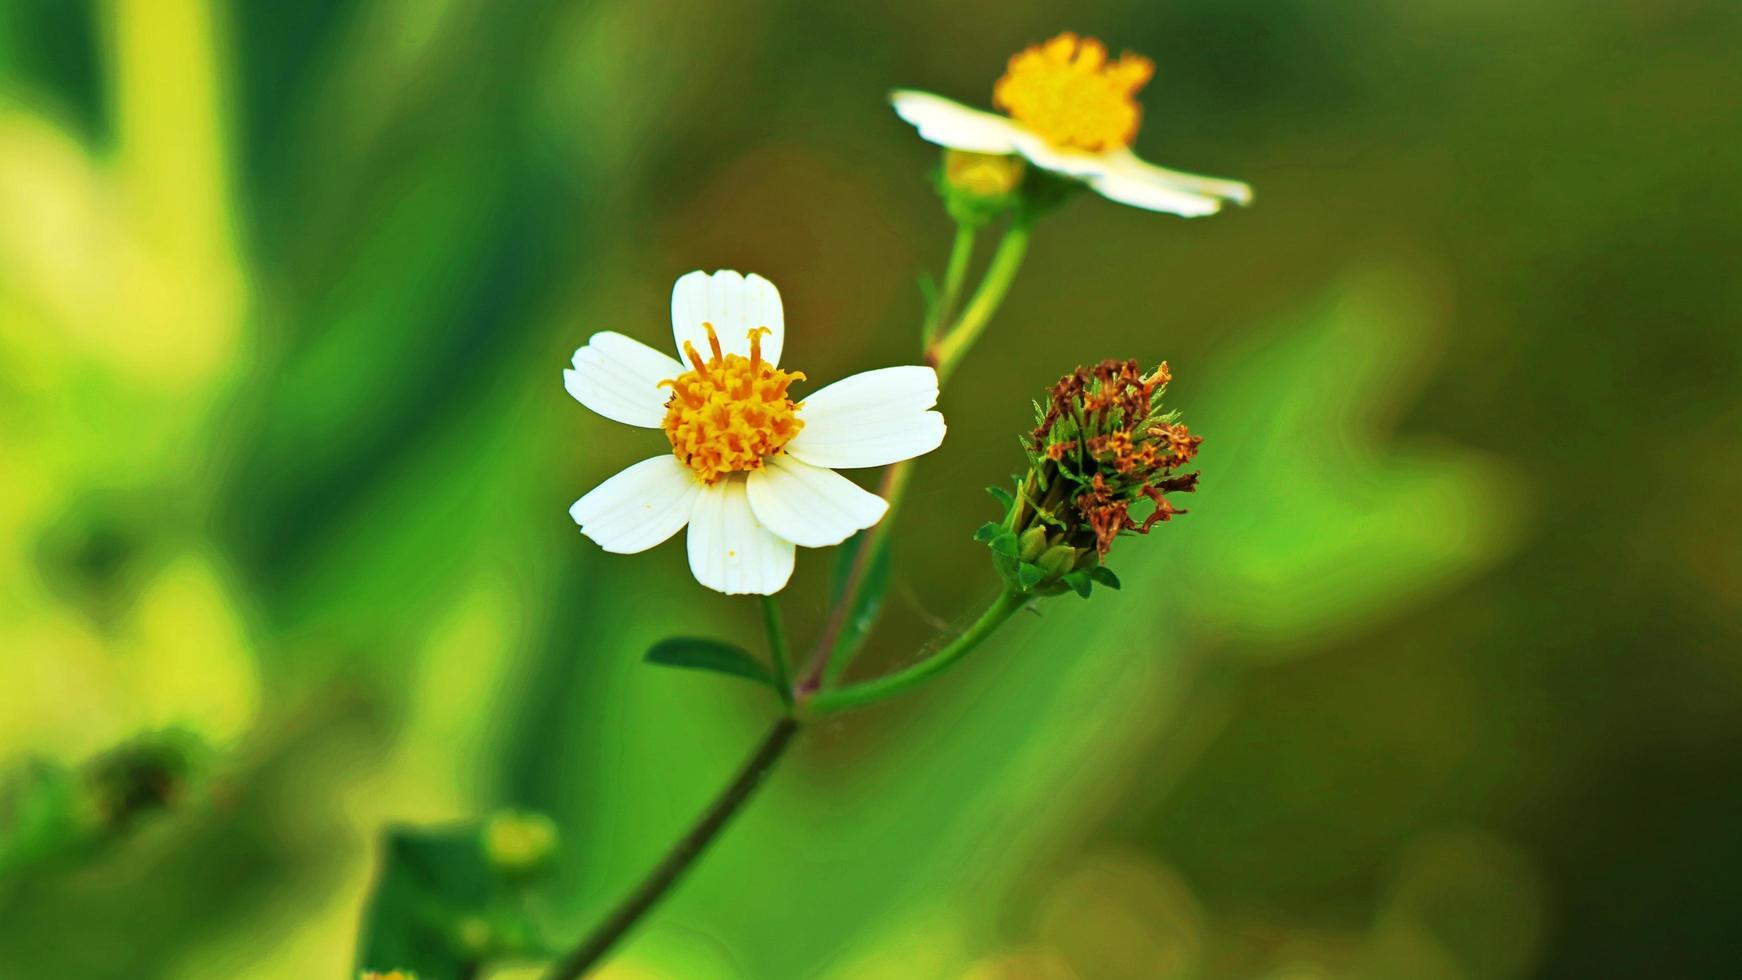 små vita blommor i en grön bakgrund foto